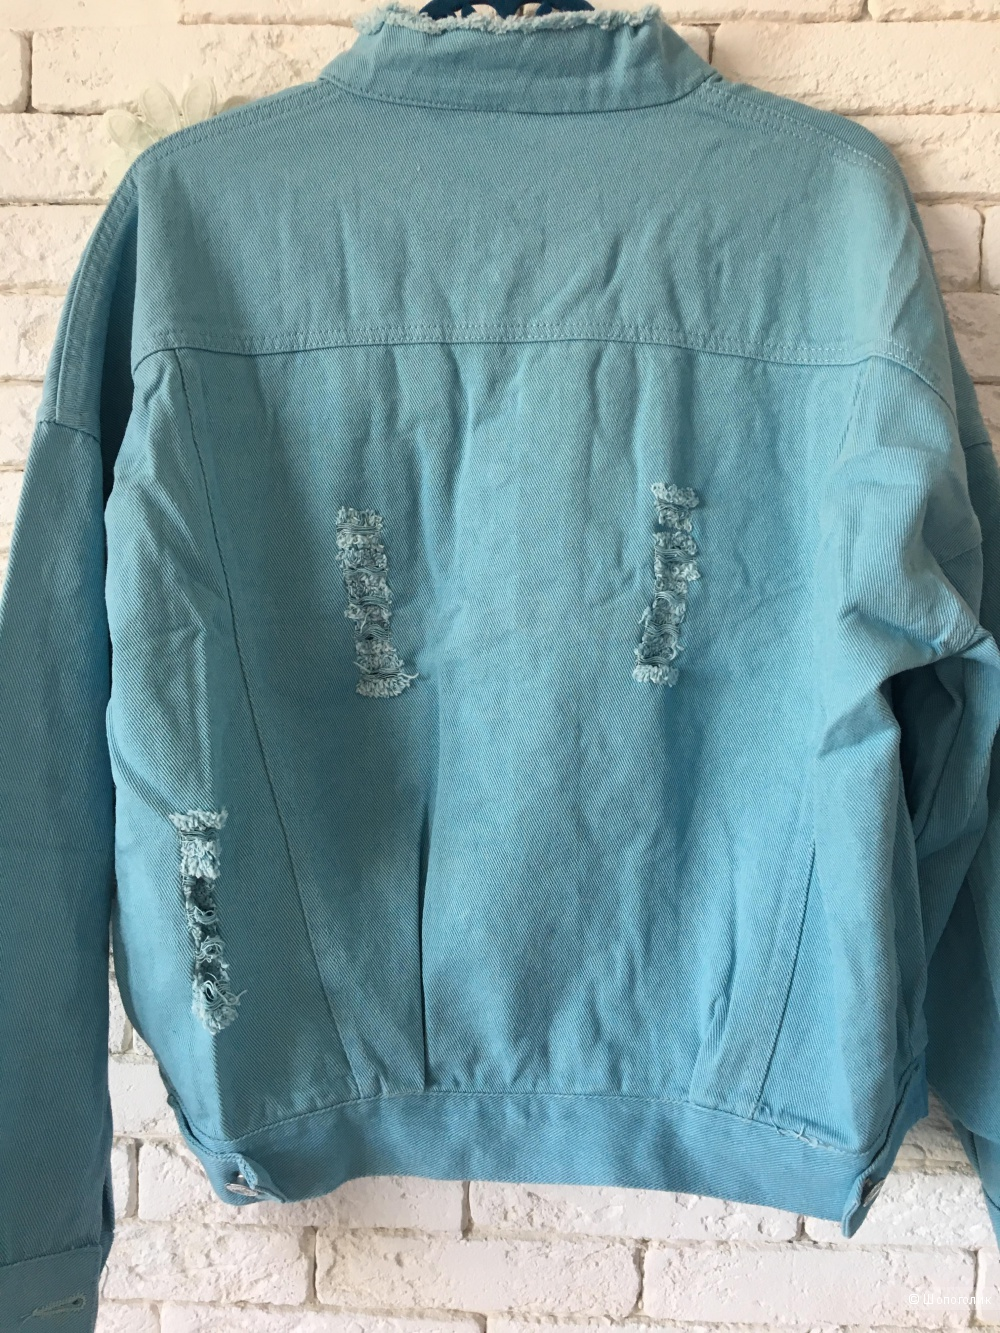 Джинсовпя куртка Blue, oversize